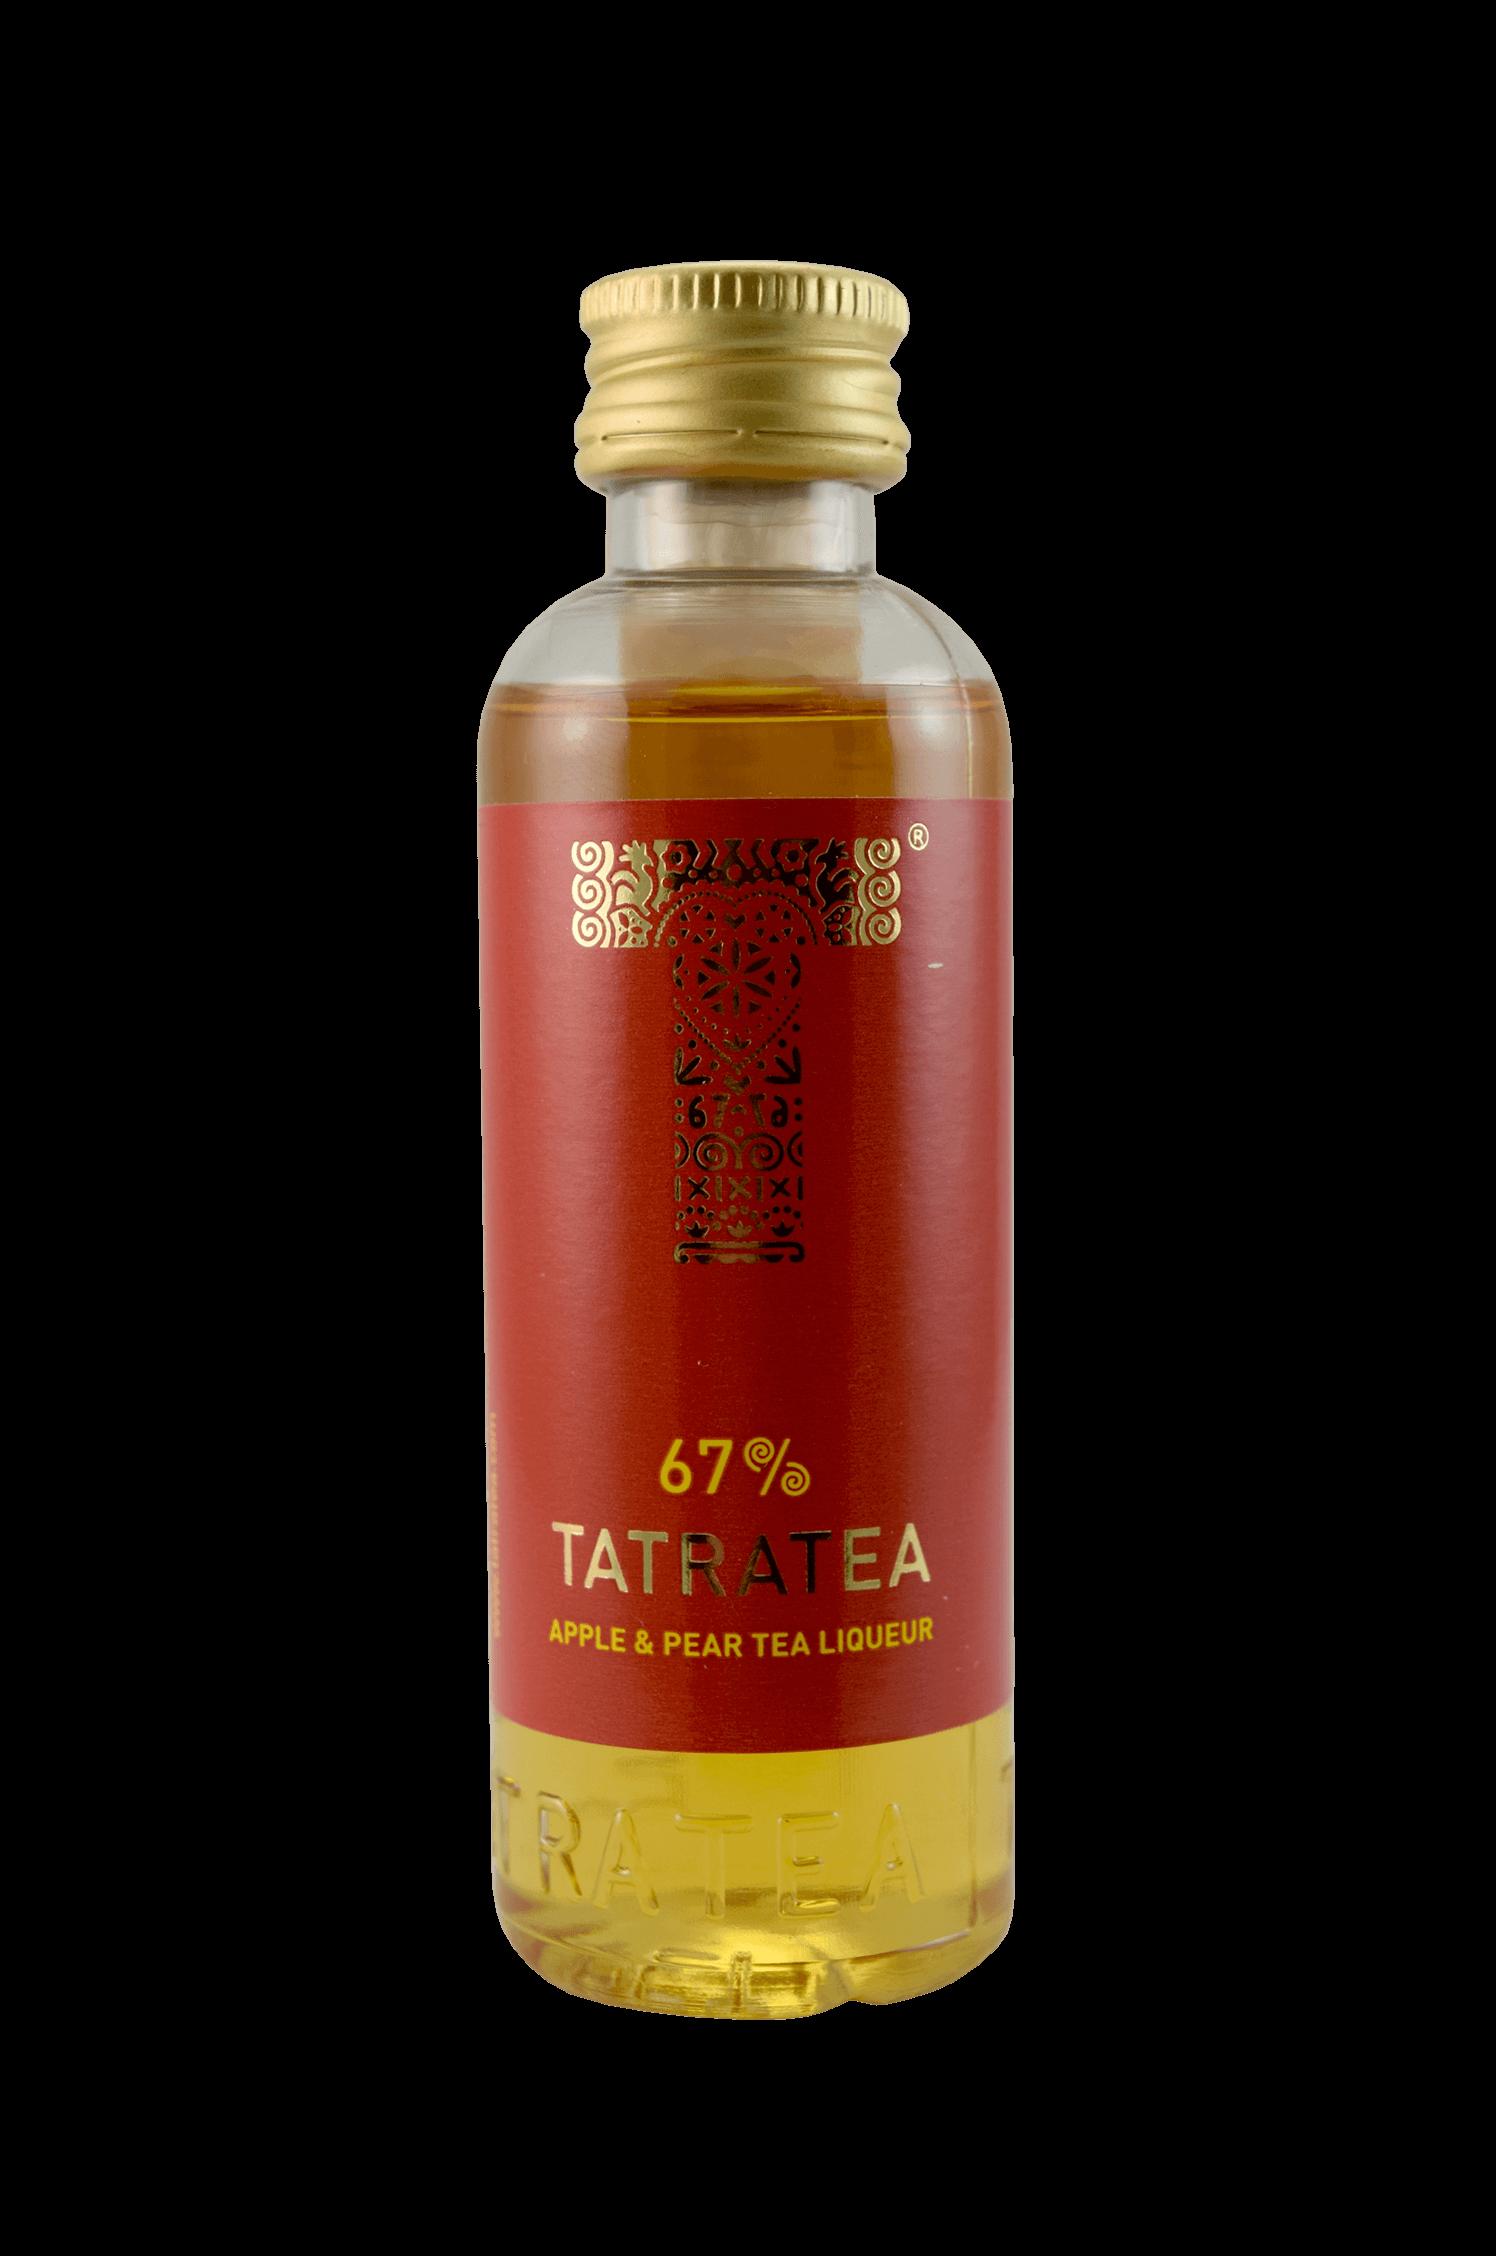 Tatratea Apple & Pear Tea Liqueur